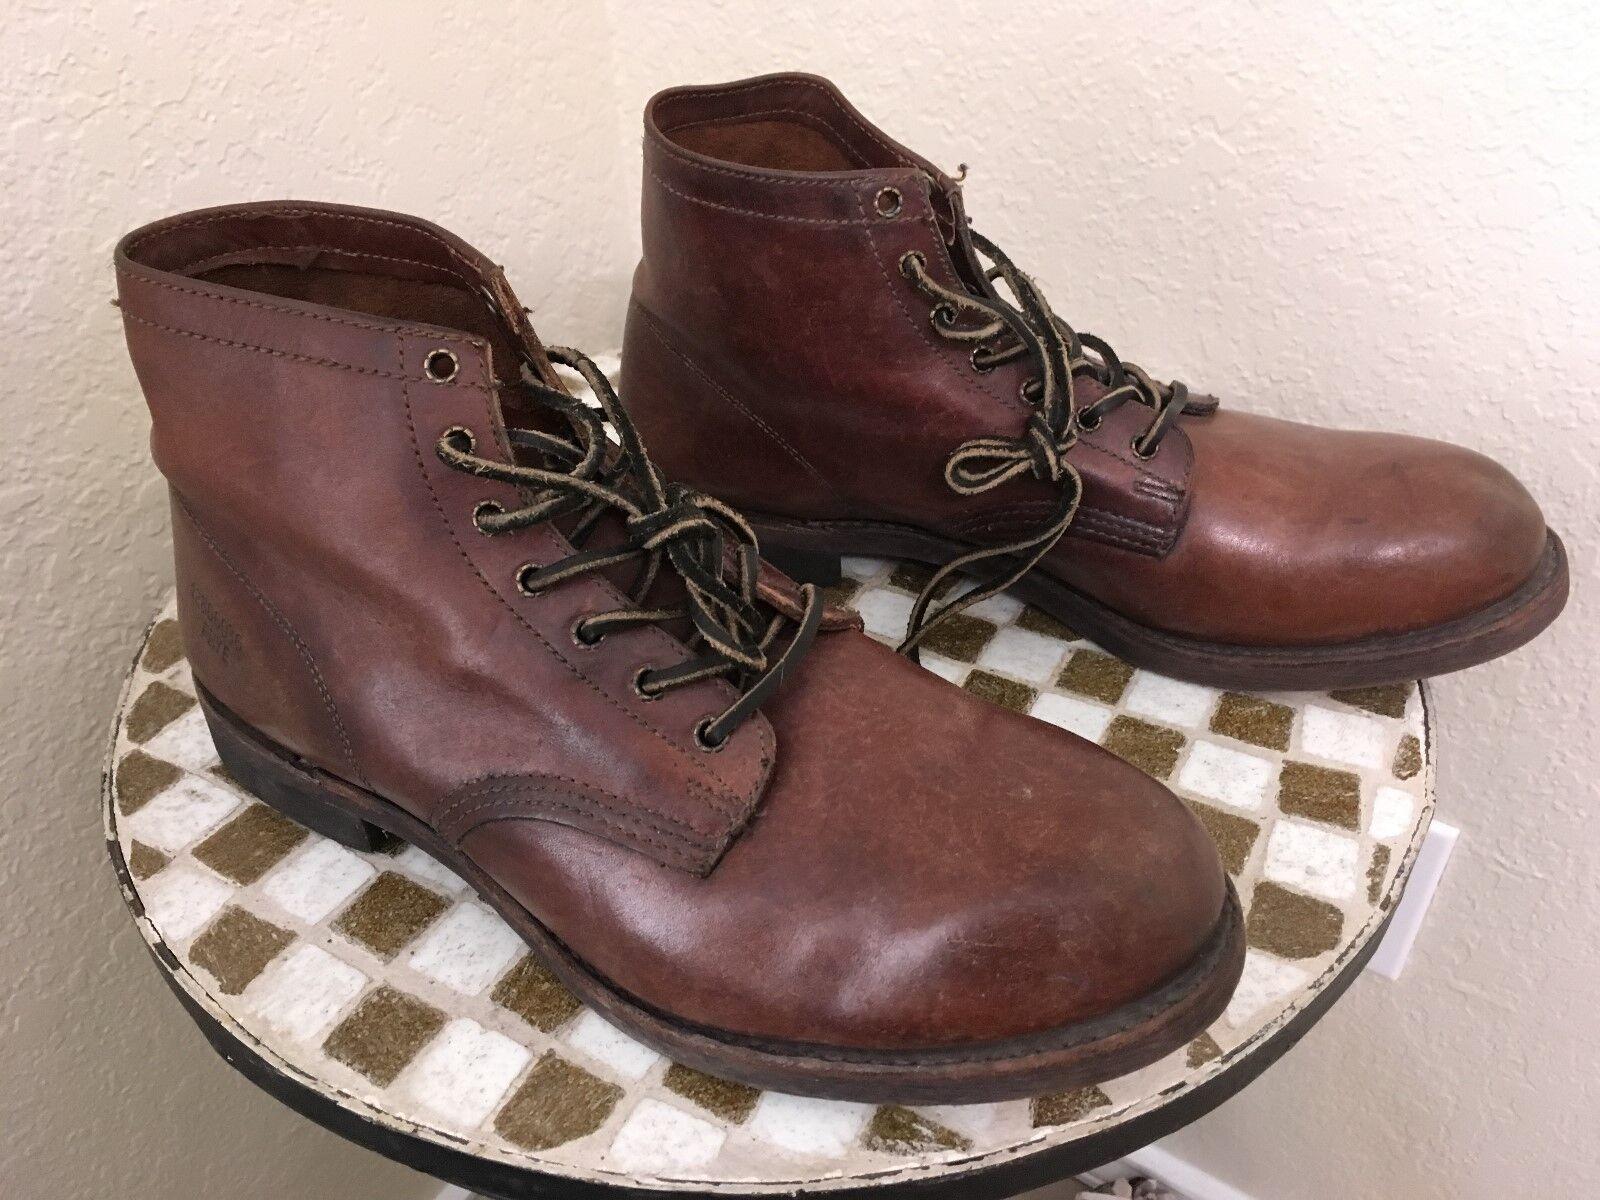 VINTAGE FRYE USA braun LEATHER WORK CHORE TRUCKER Stiefel Stiefel Stiefel 13 M e7b184